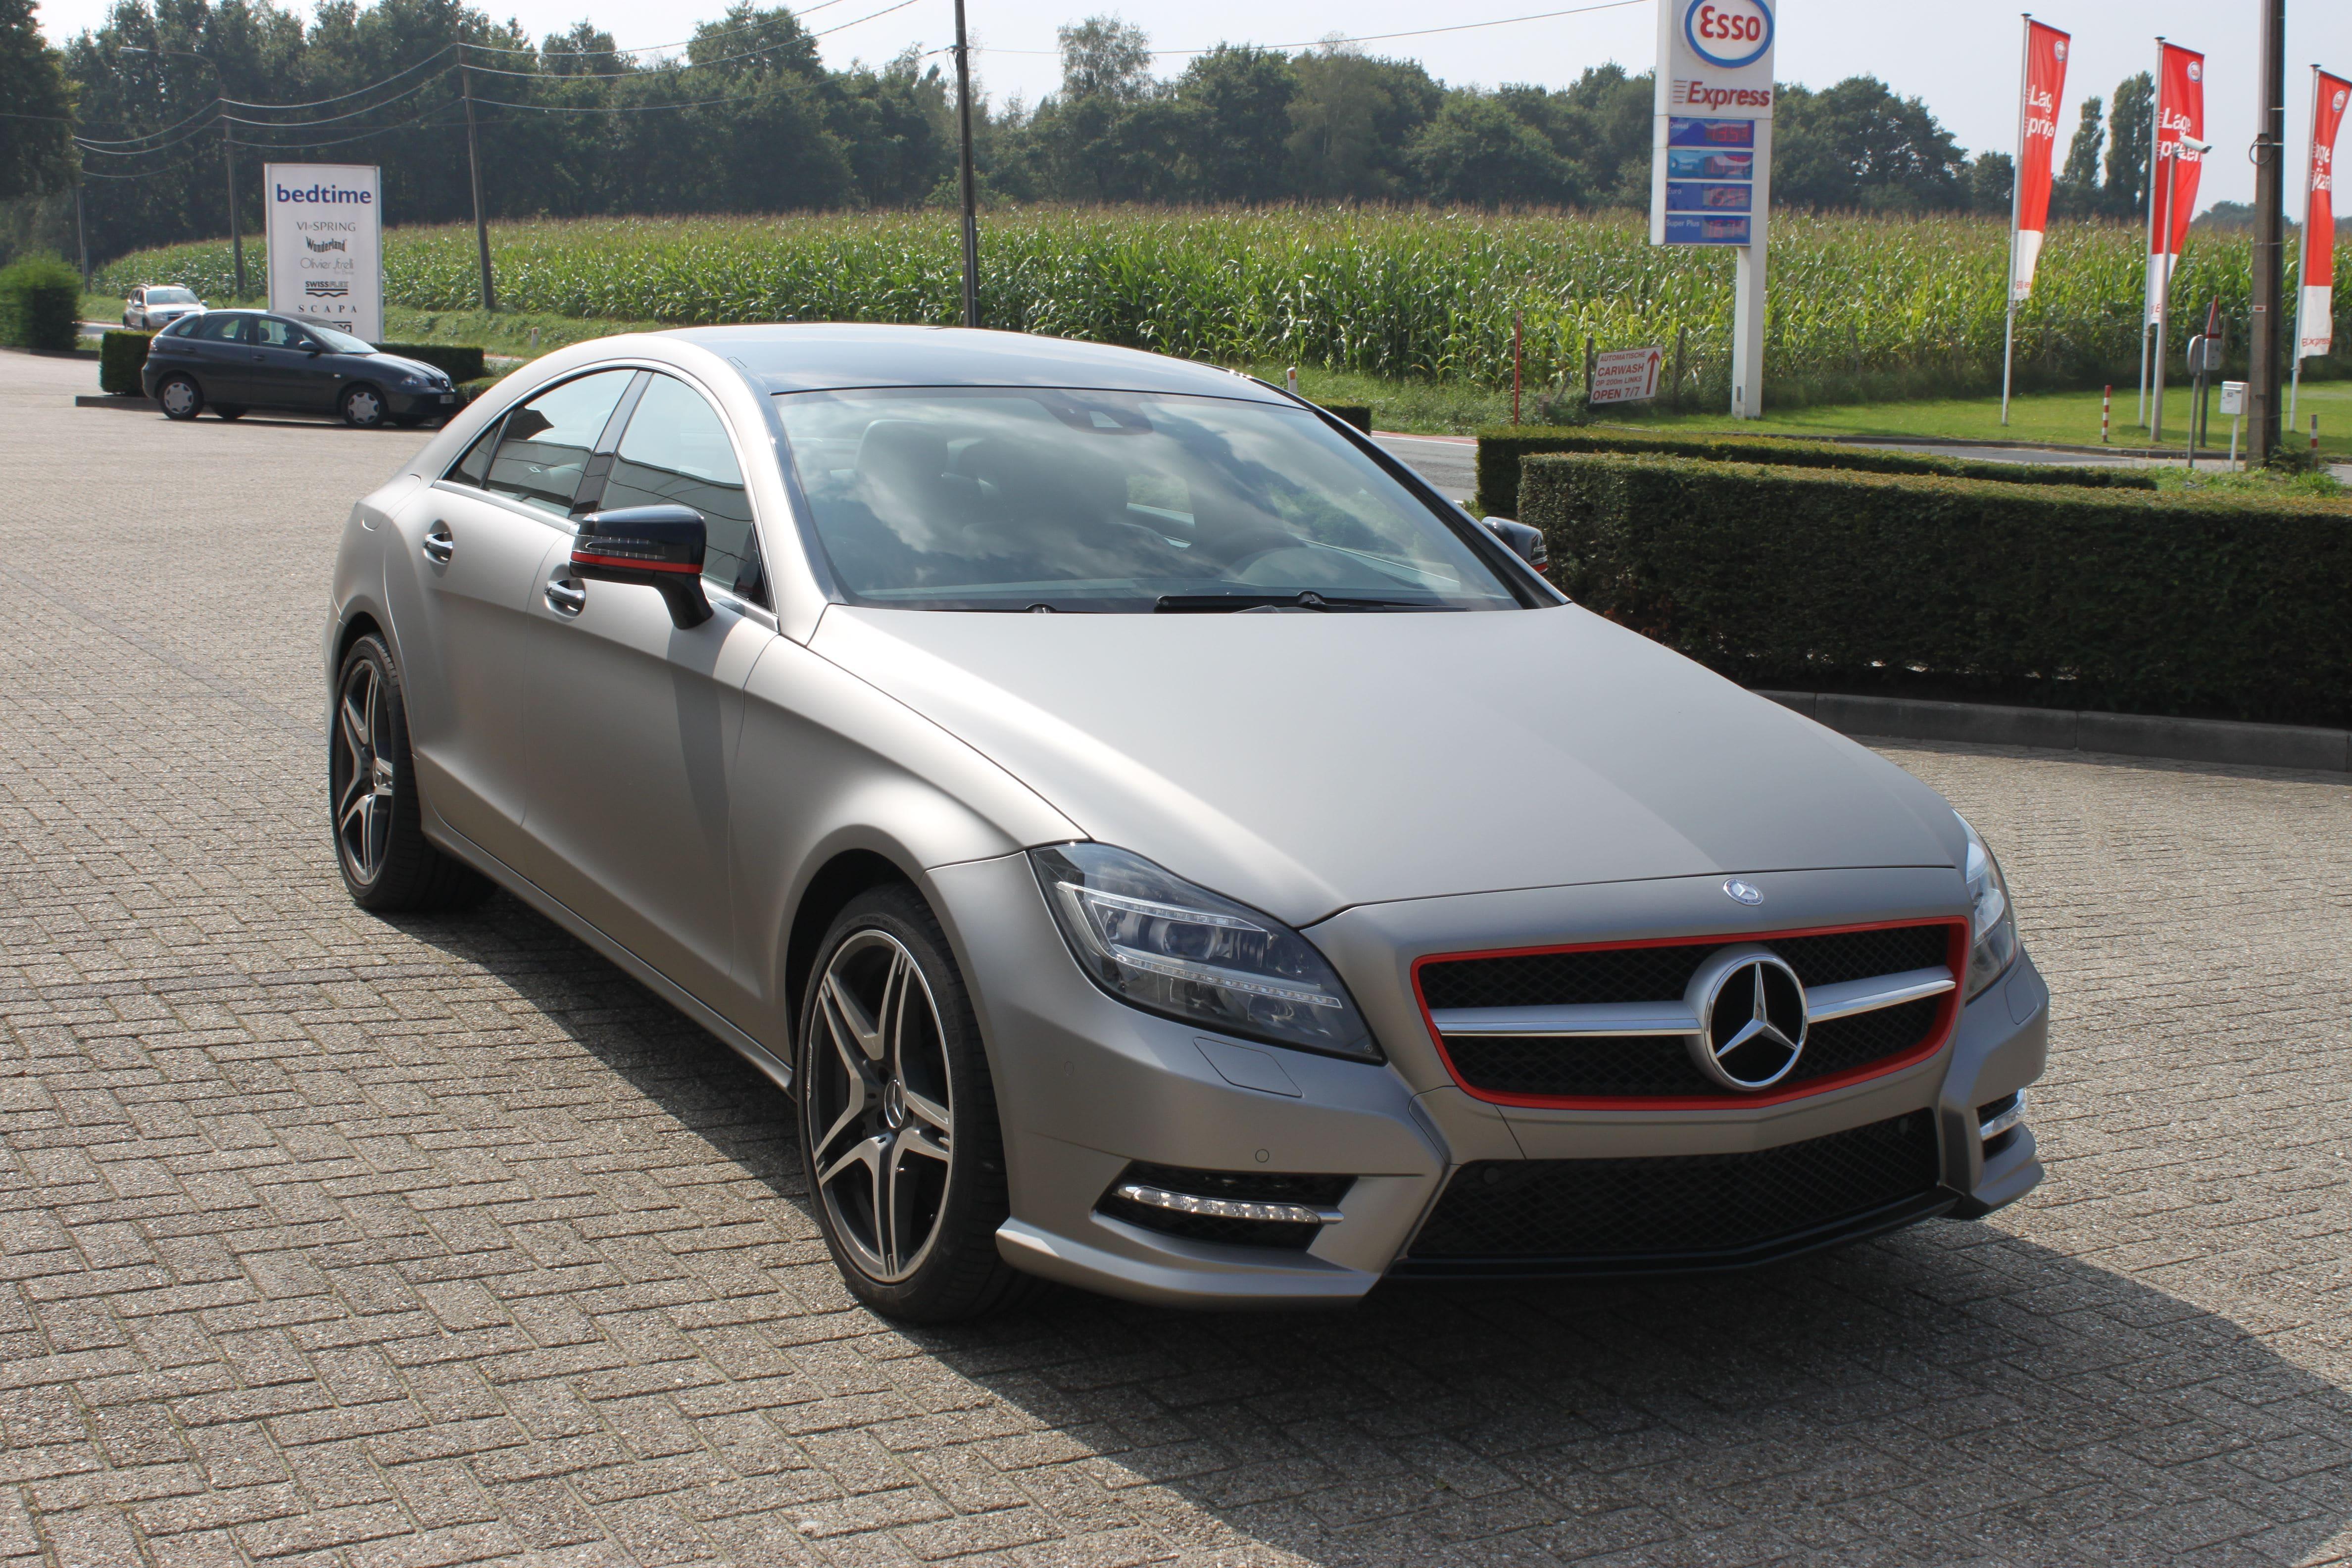 Mercedes CLS met Mat Grey Aluminium Wrap, Carwrapping door Wrapmyride.nu Foto-nr:6155, ©2020